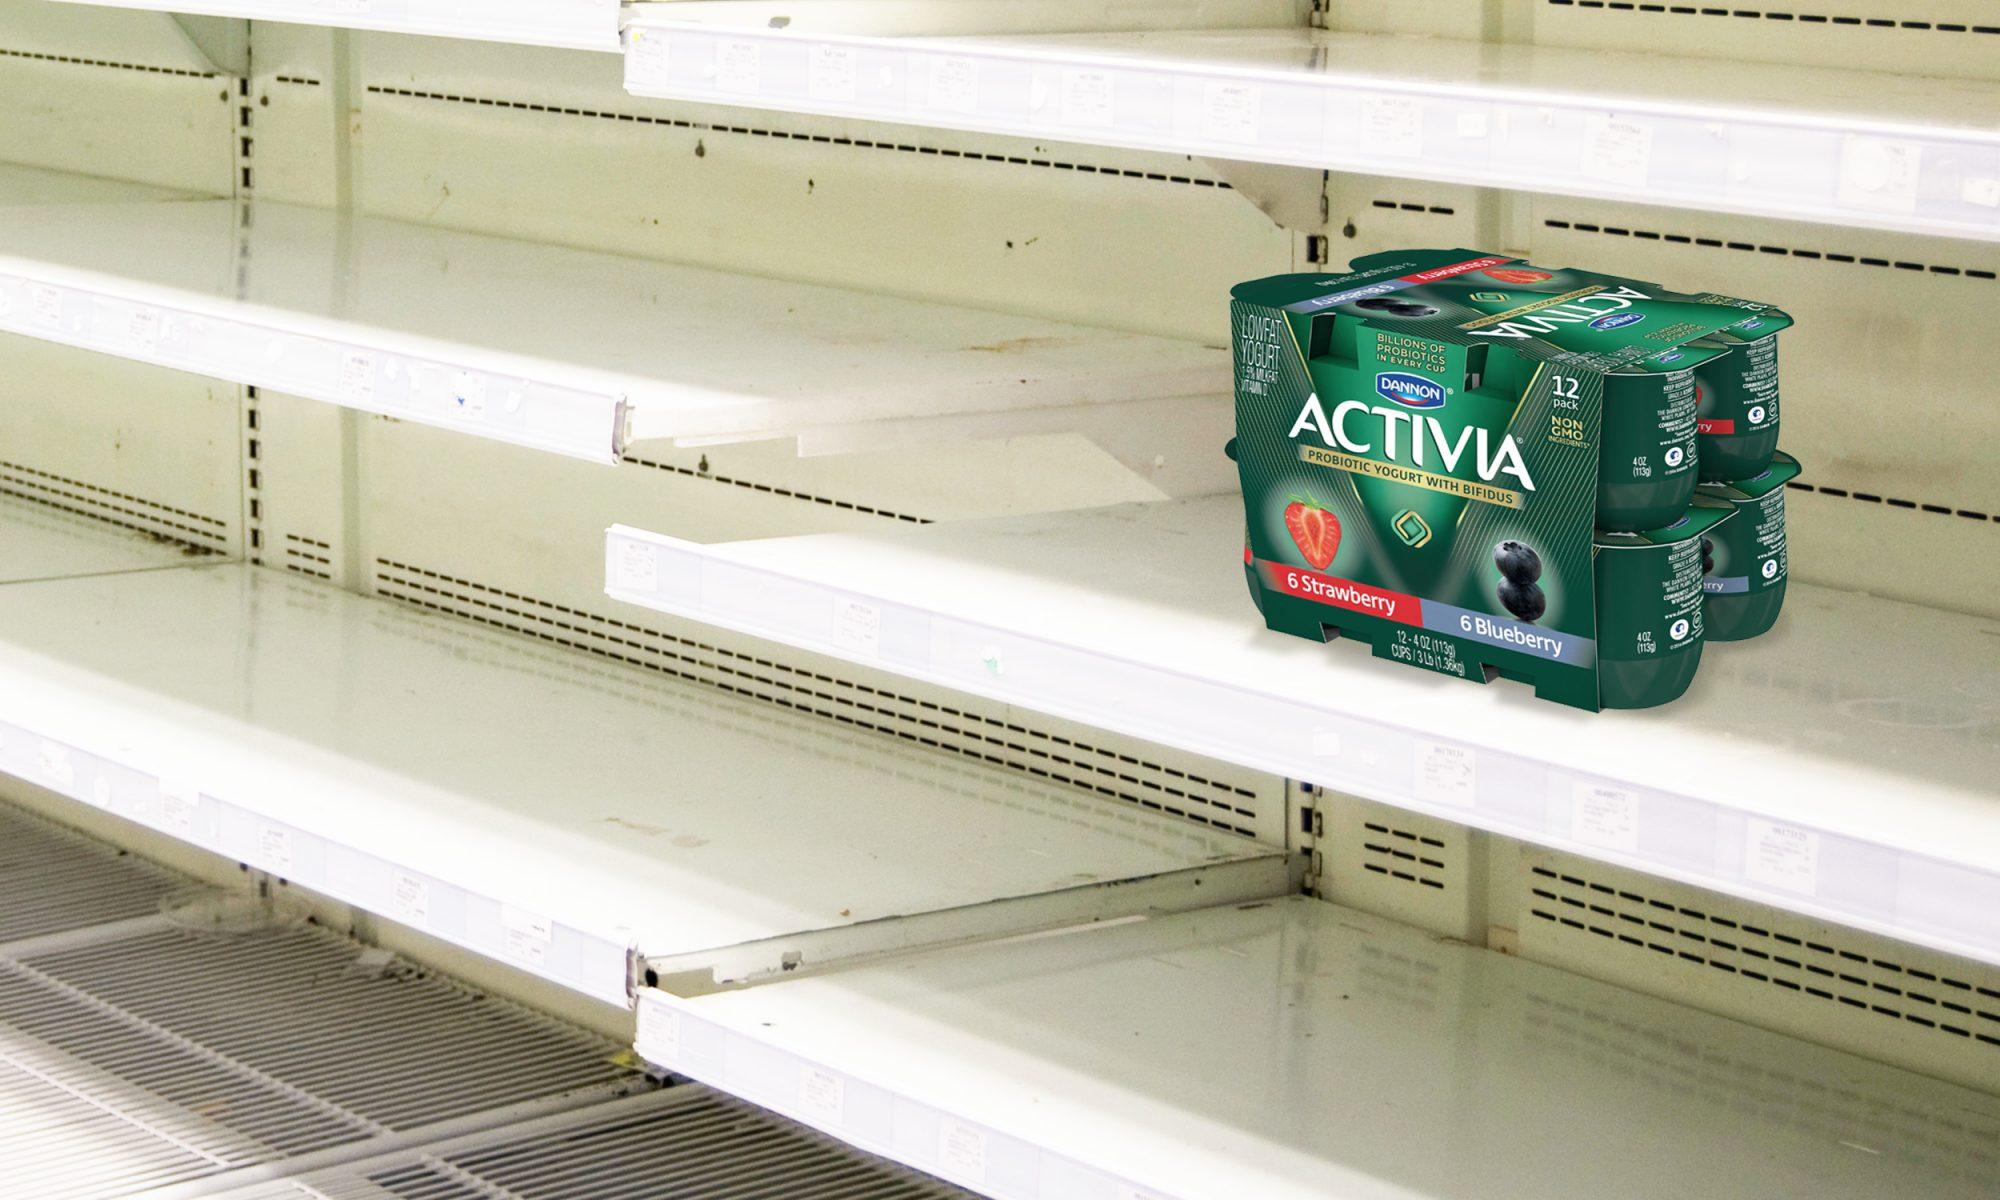 EC: Whatever Happened to Activia?